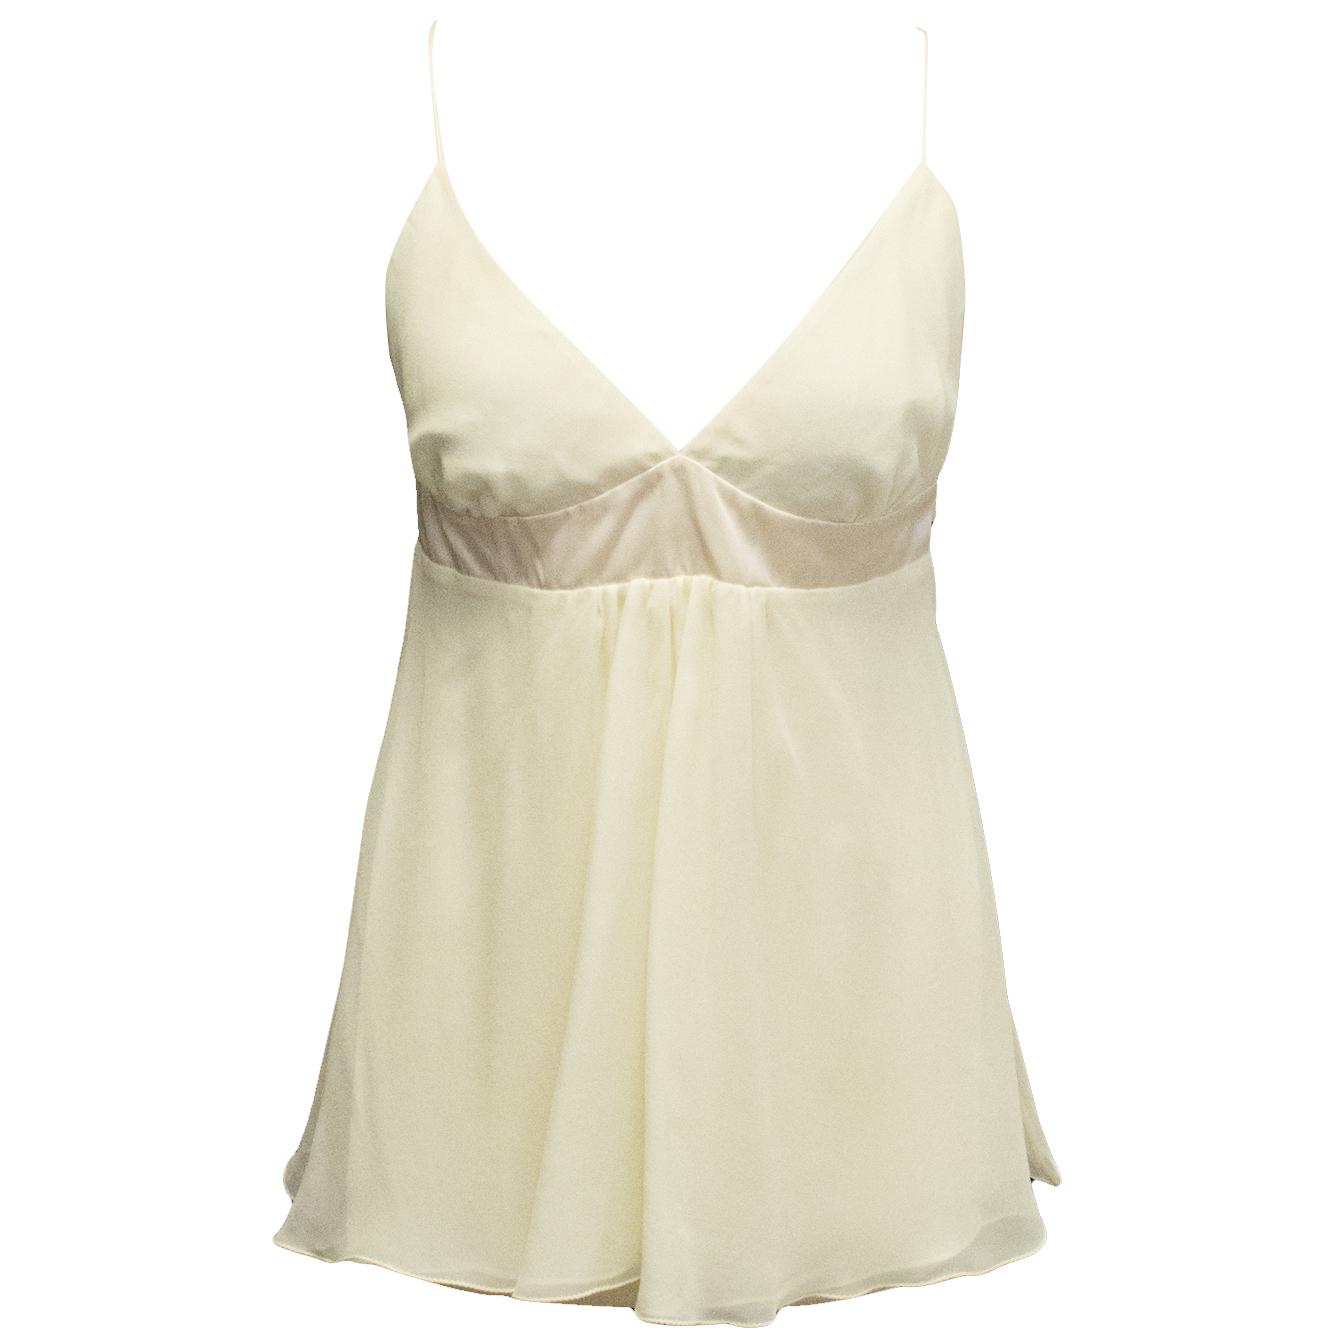 Tashia London cream silk empire line top